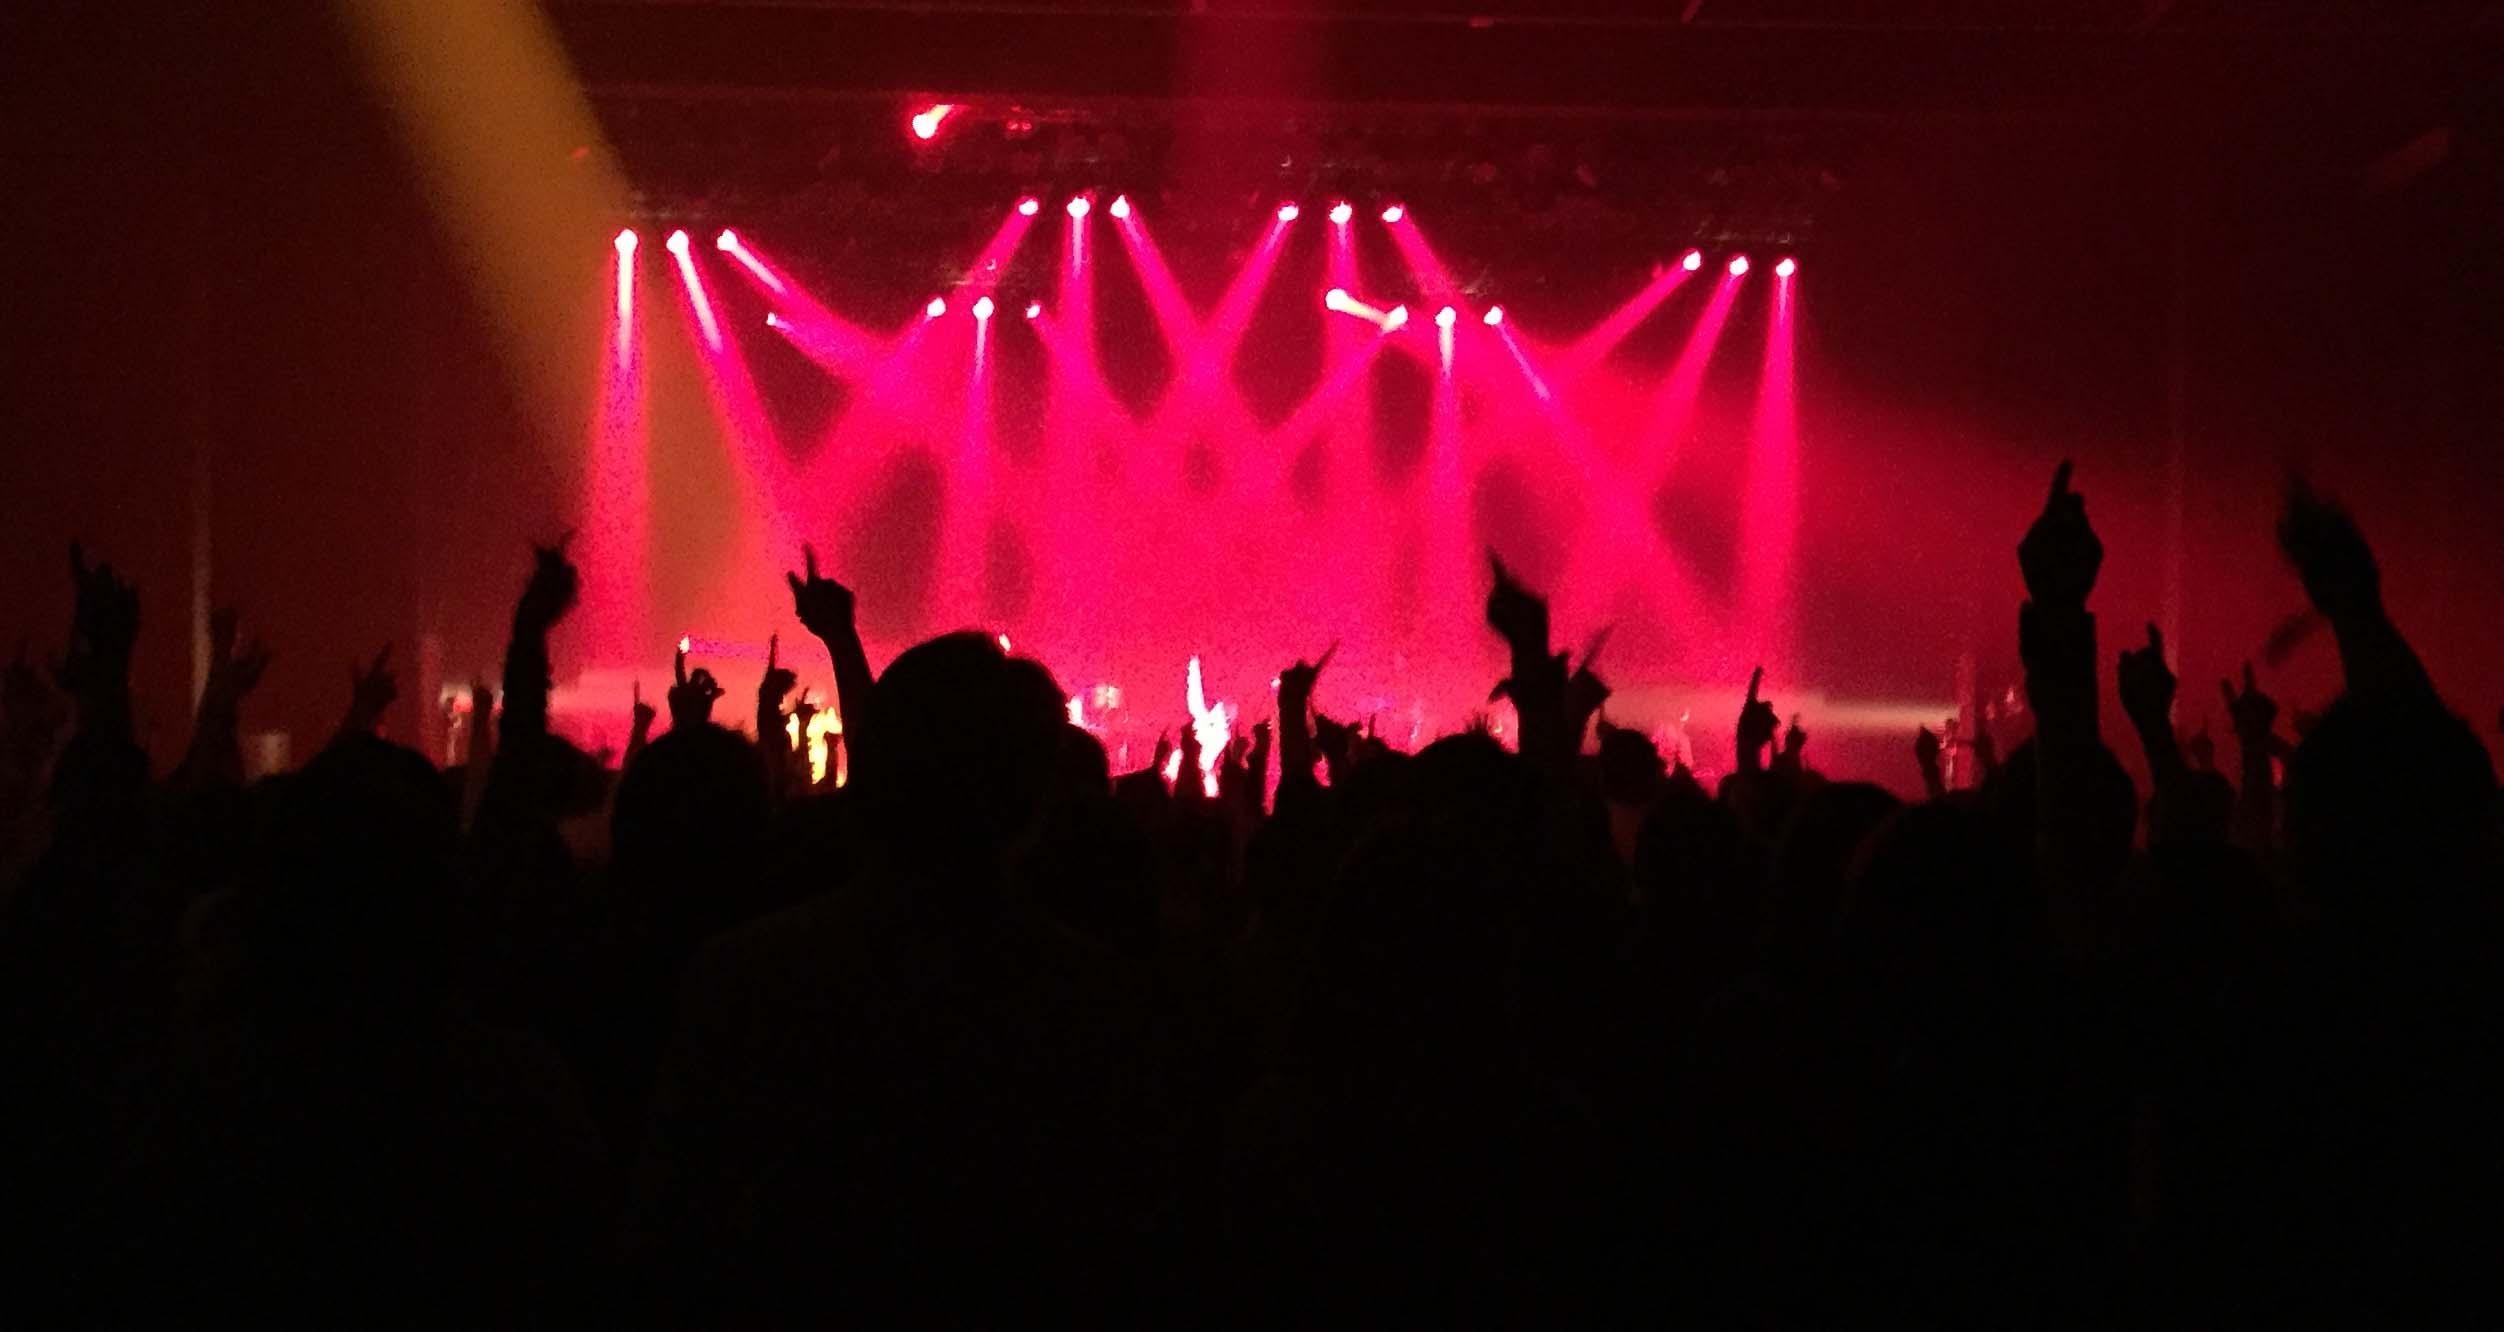 『Chage Live Tour 2015 〜天使がくれたハンマー〜』全公演終了!